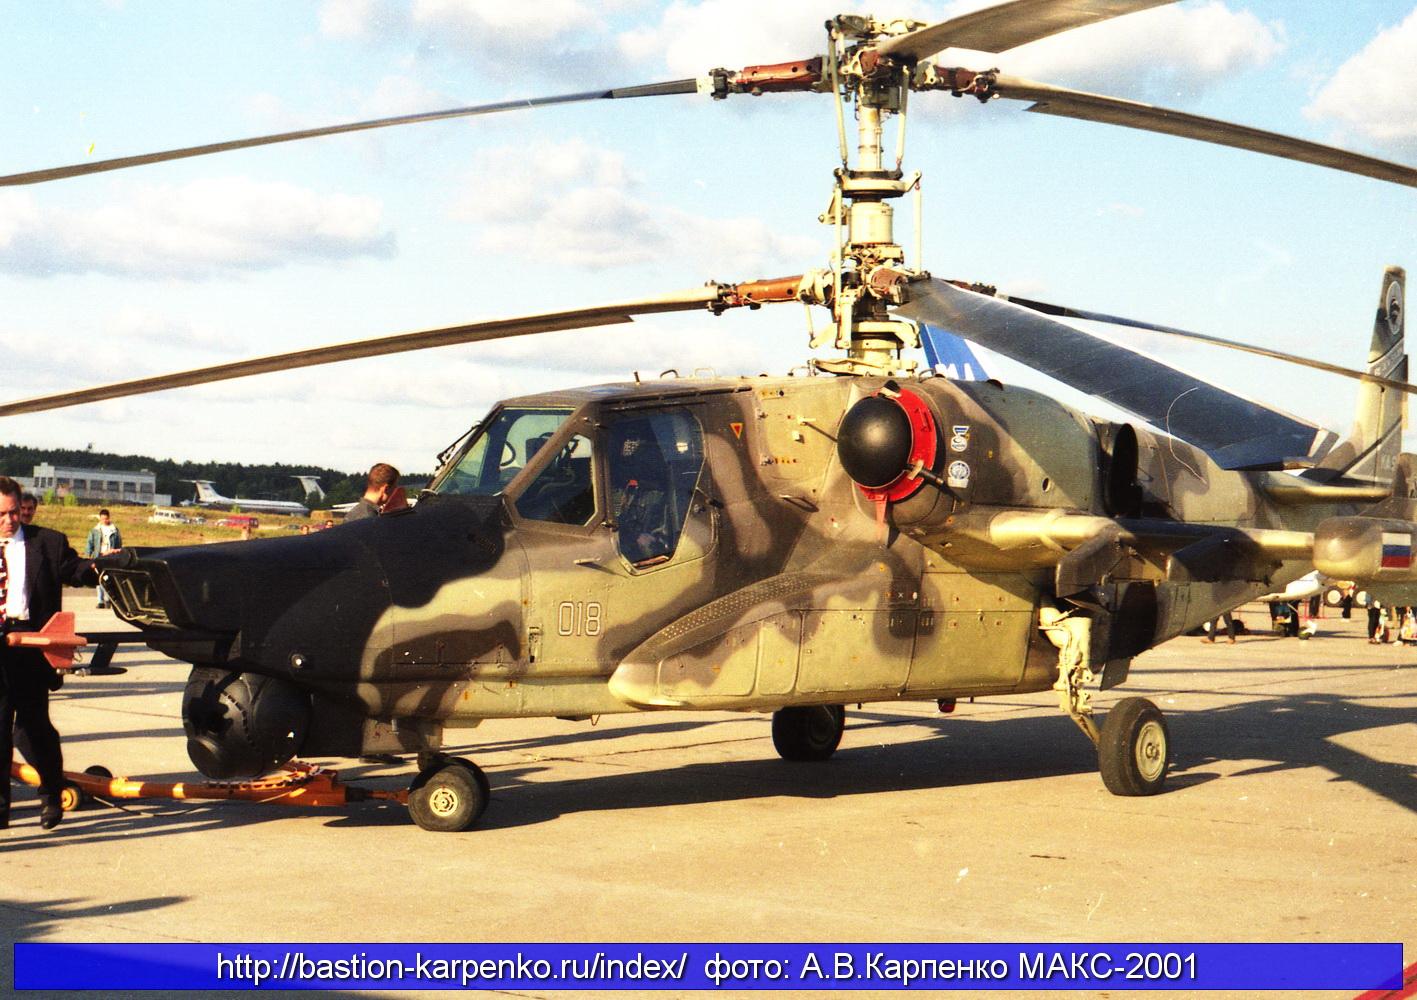 ka-50_maks-2001_01.jpg